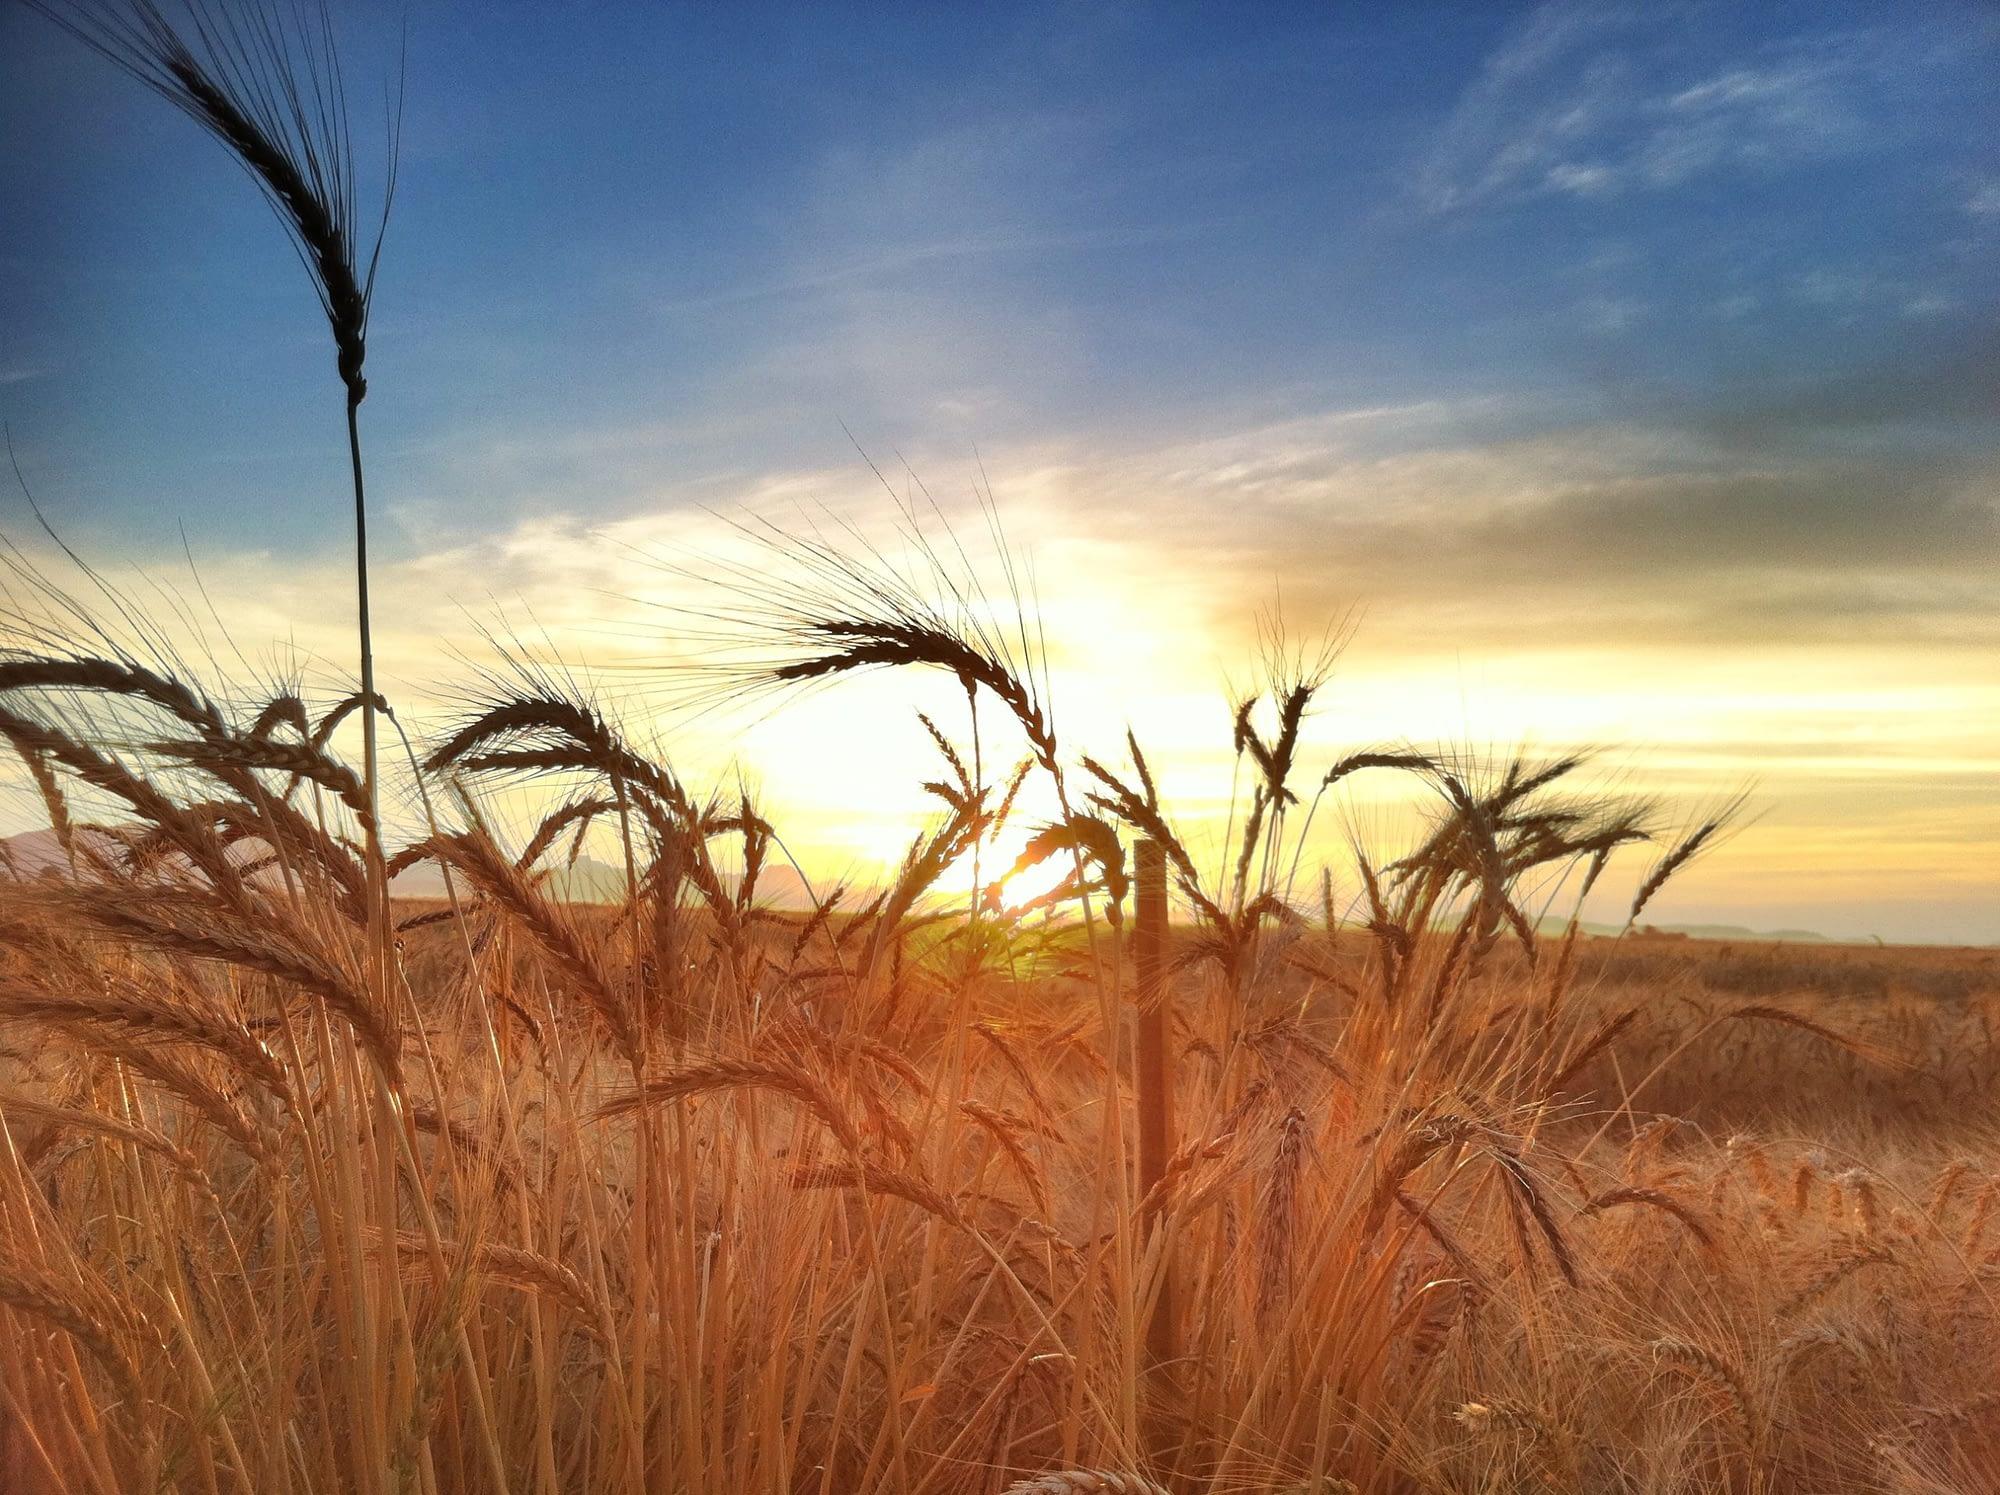 Wheat fields at CIMMYT's experimental stations near Ciudad Obregón, Sonora state, Mexico. (Photo: M. Ellis/CIMMYT)